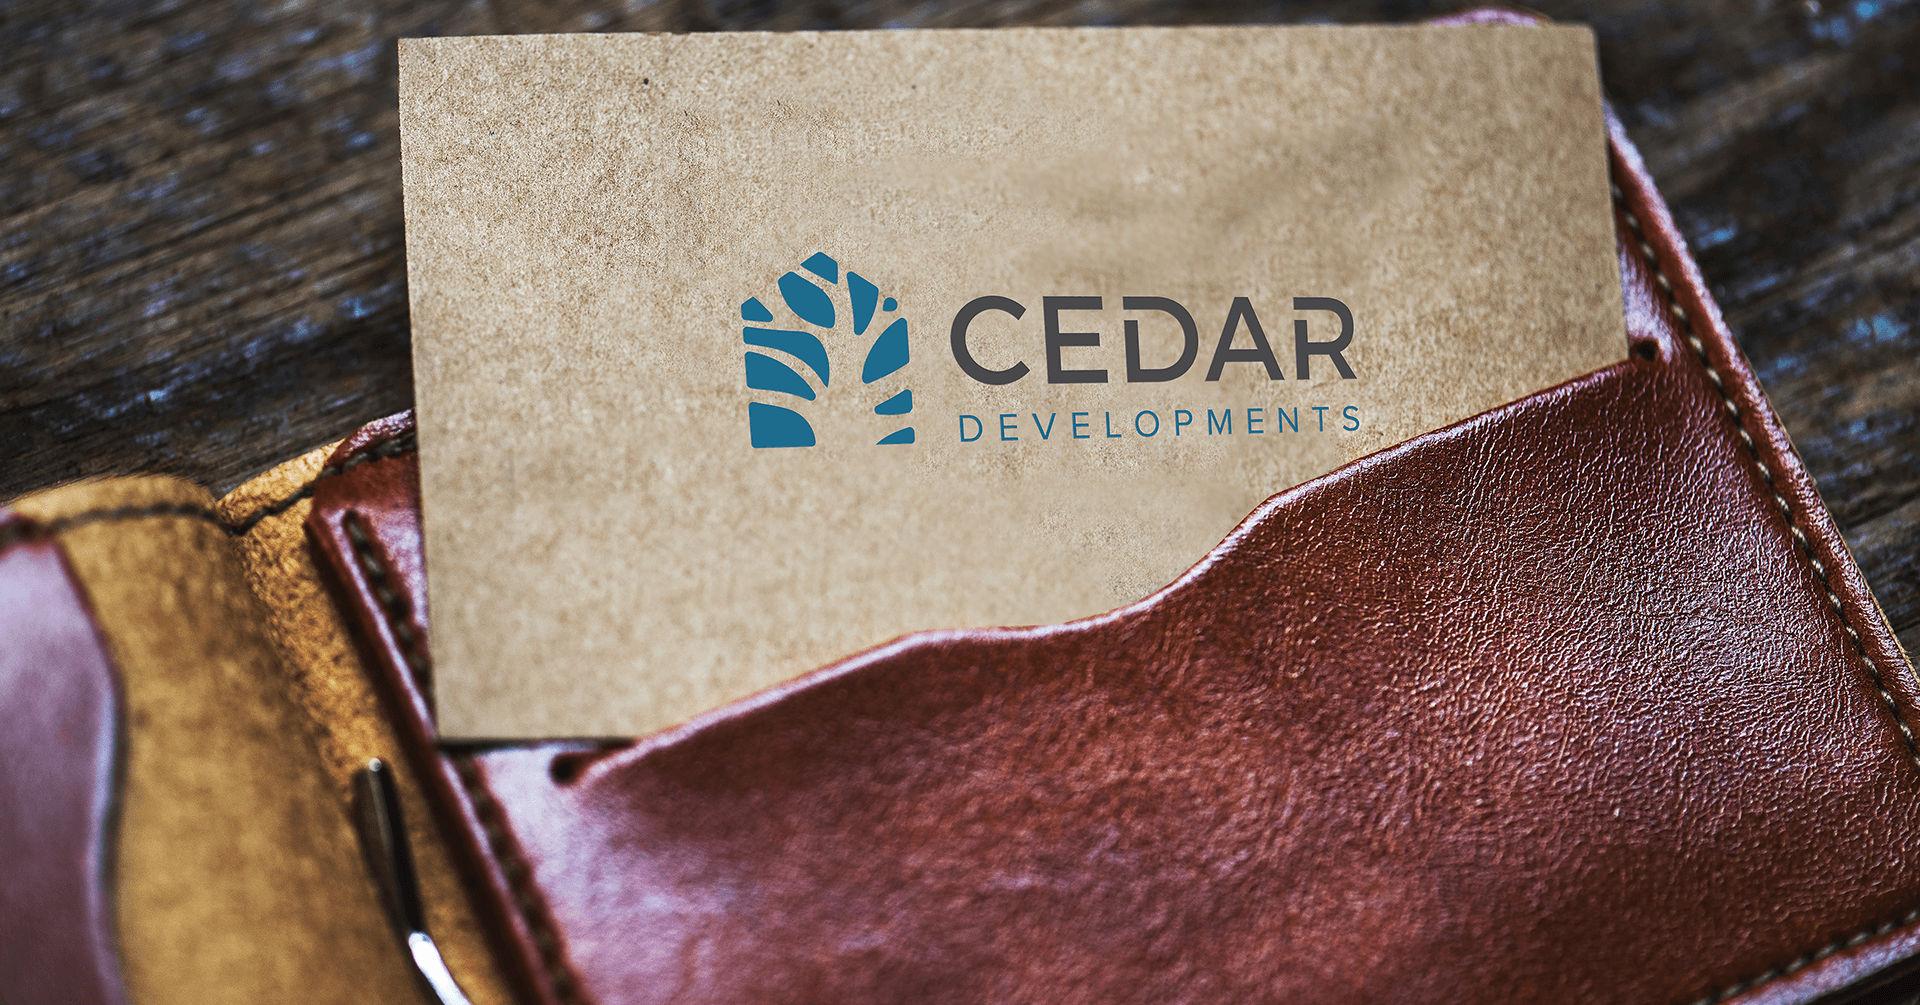 Cedar Developments Card - iDesign Branding